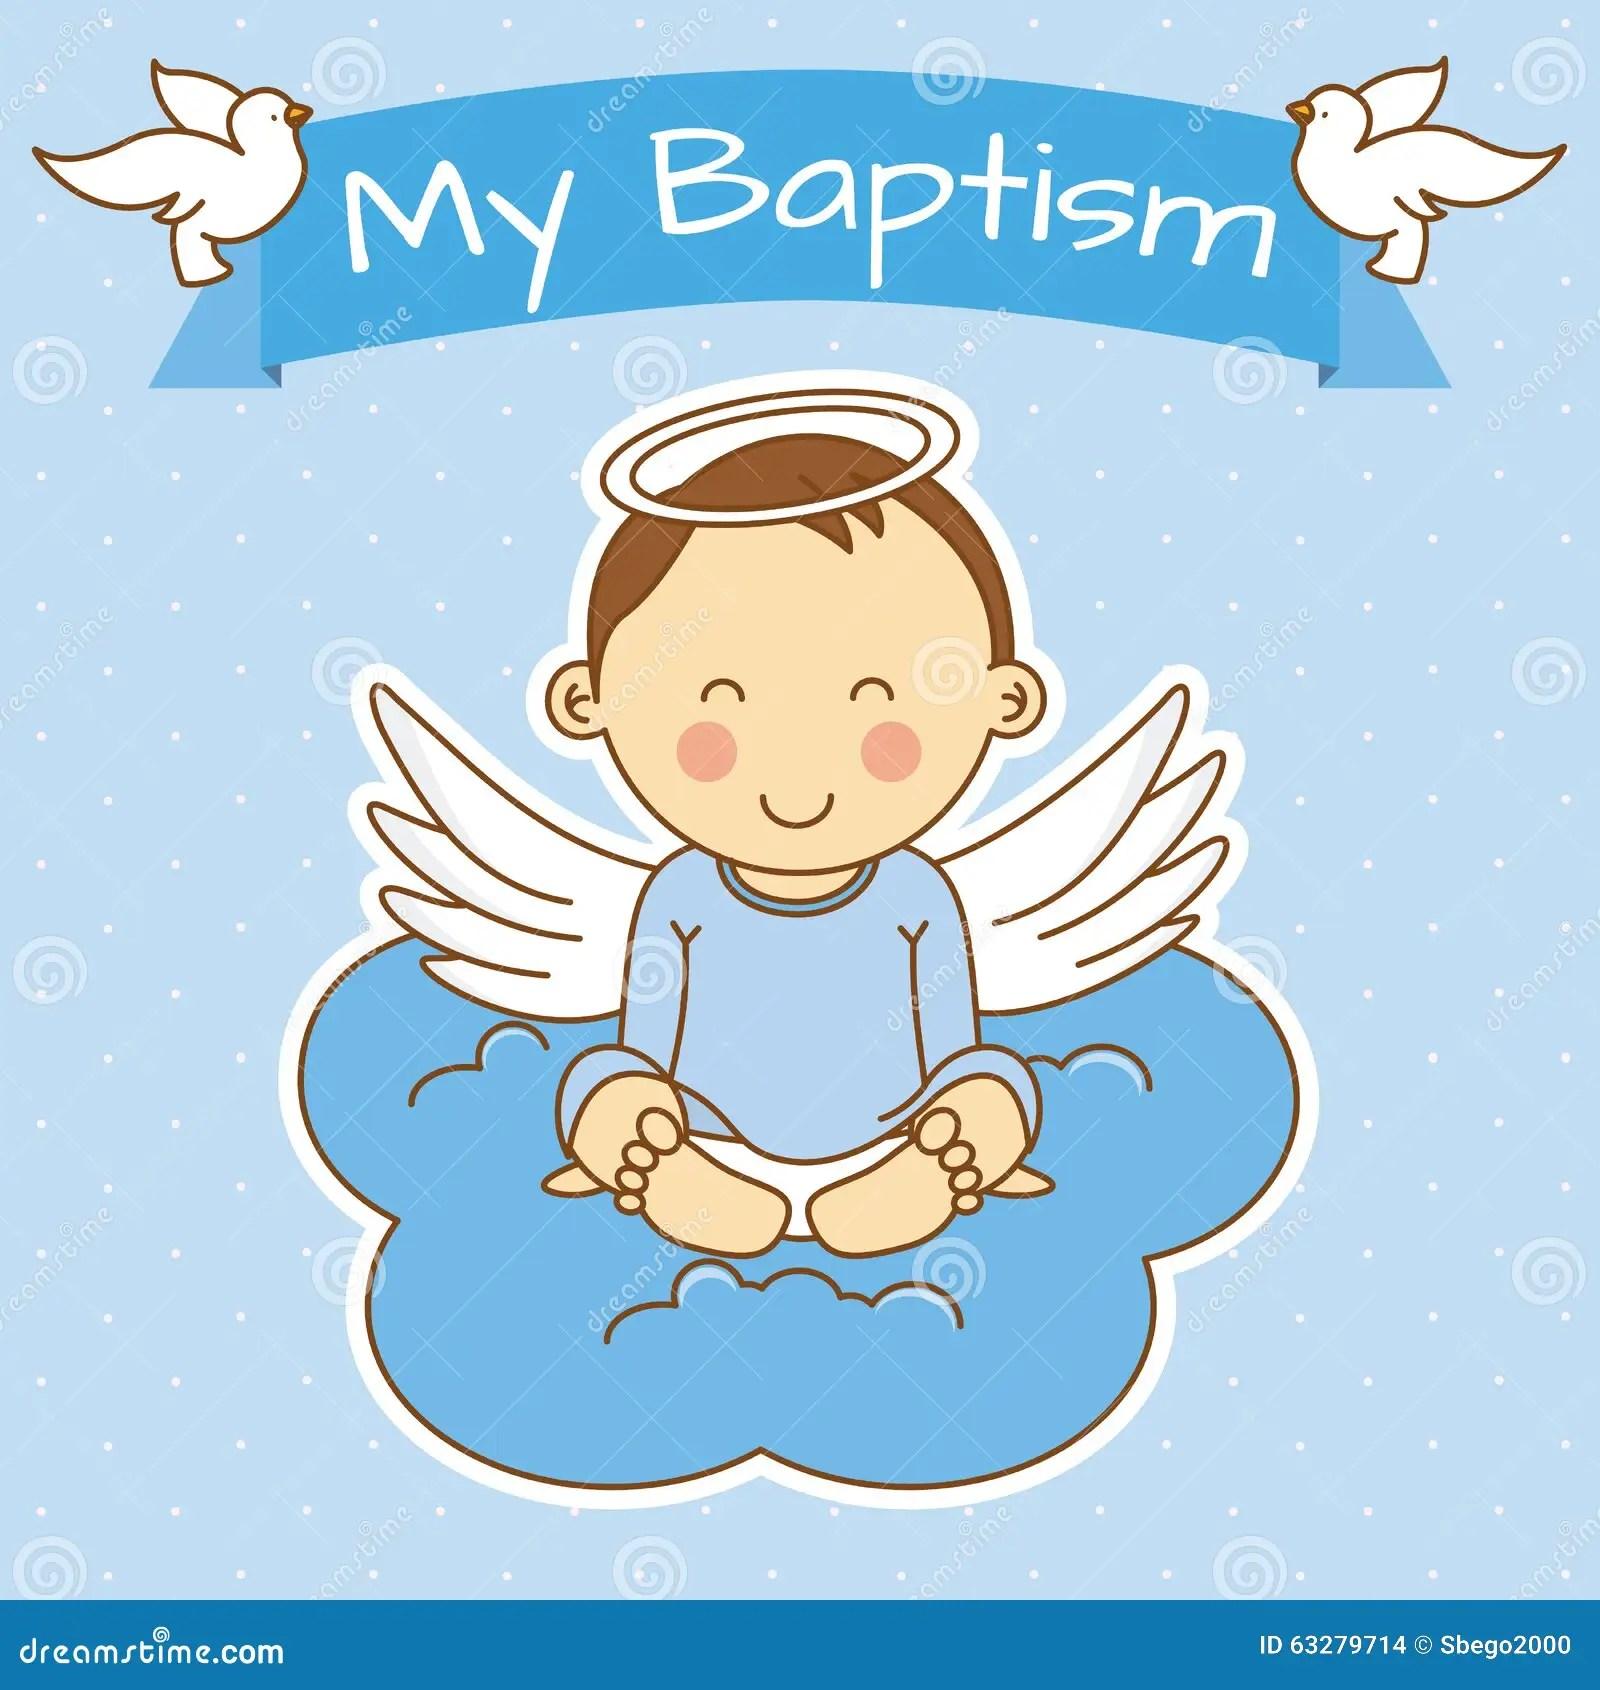 Invitation Card Baptism Baby Boy